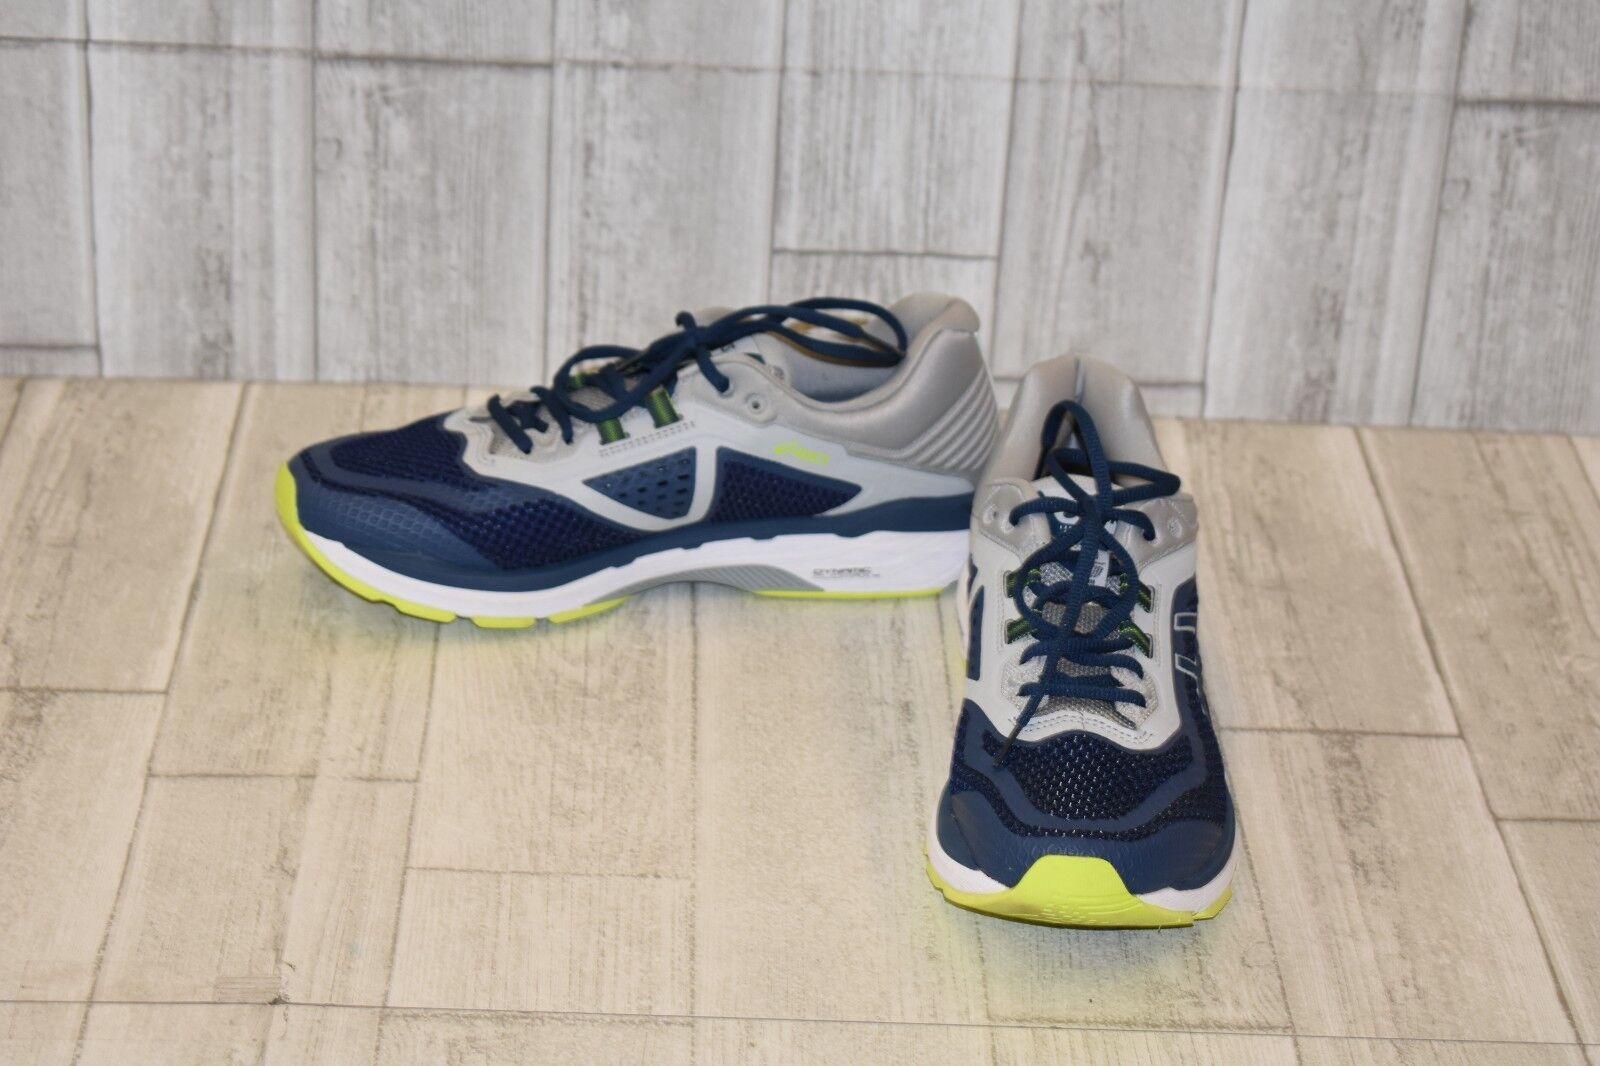 ASICS GT-2000 6 Running shoes, men's Size 11.5, bluee